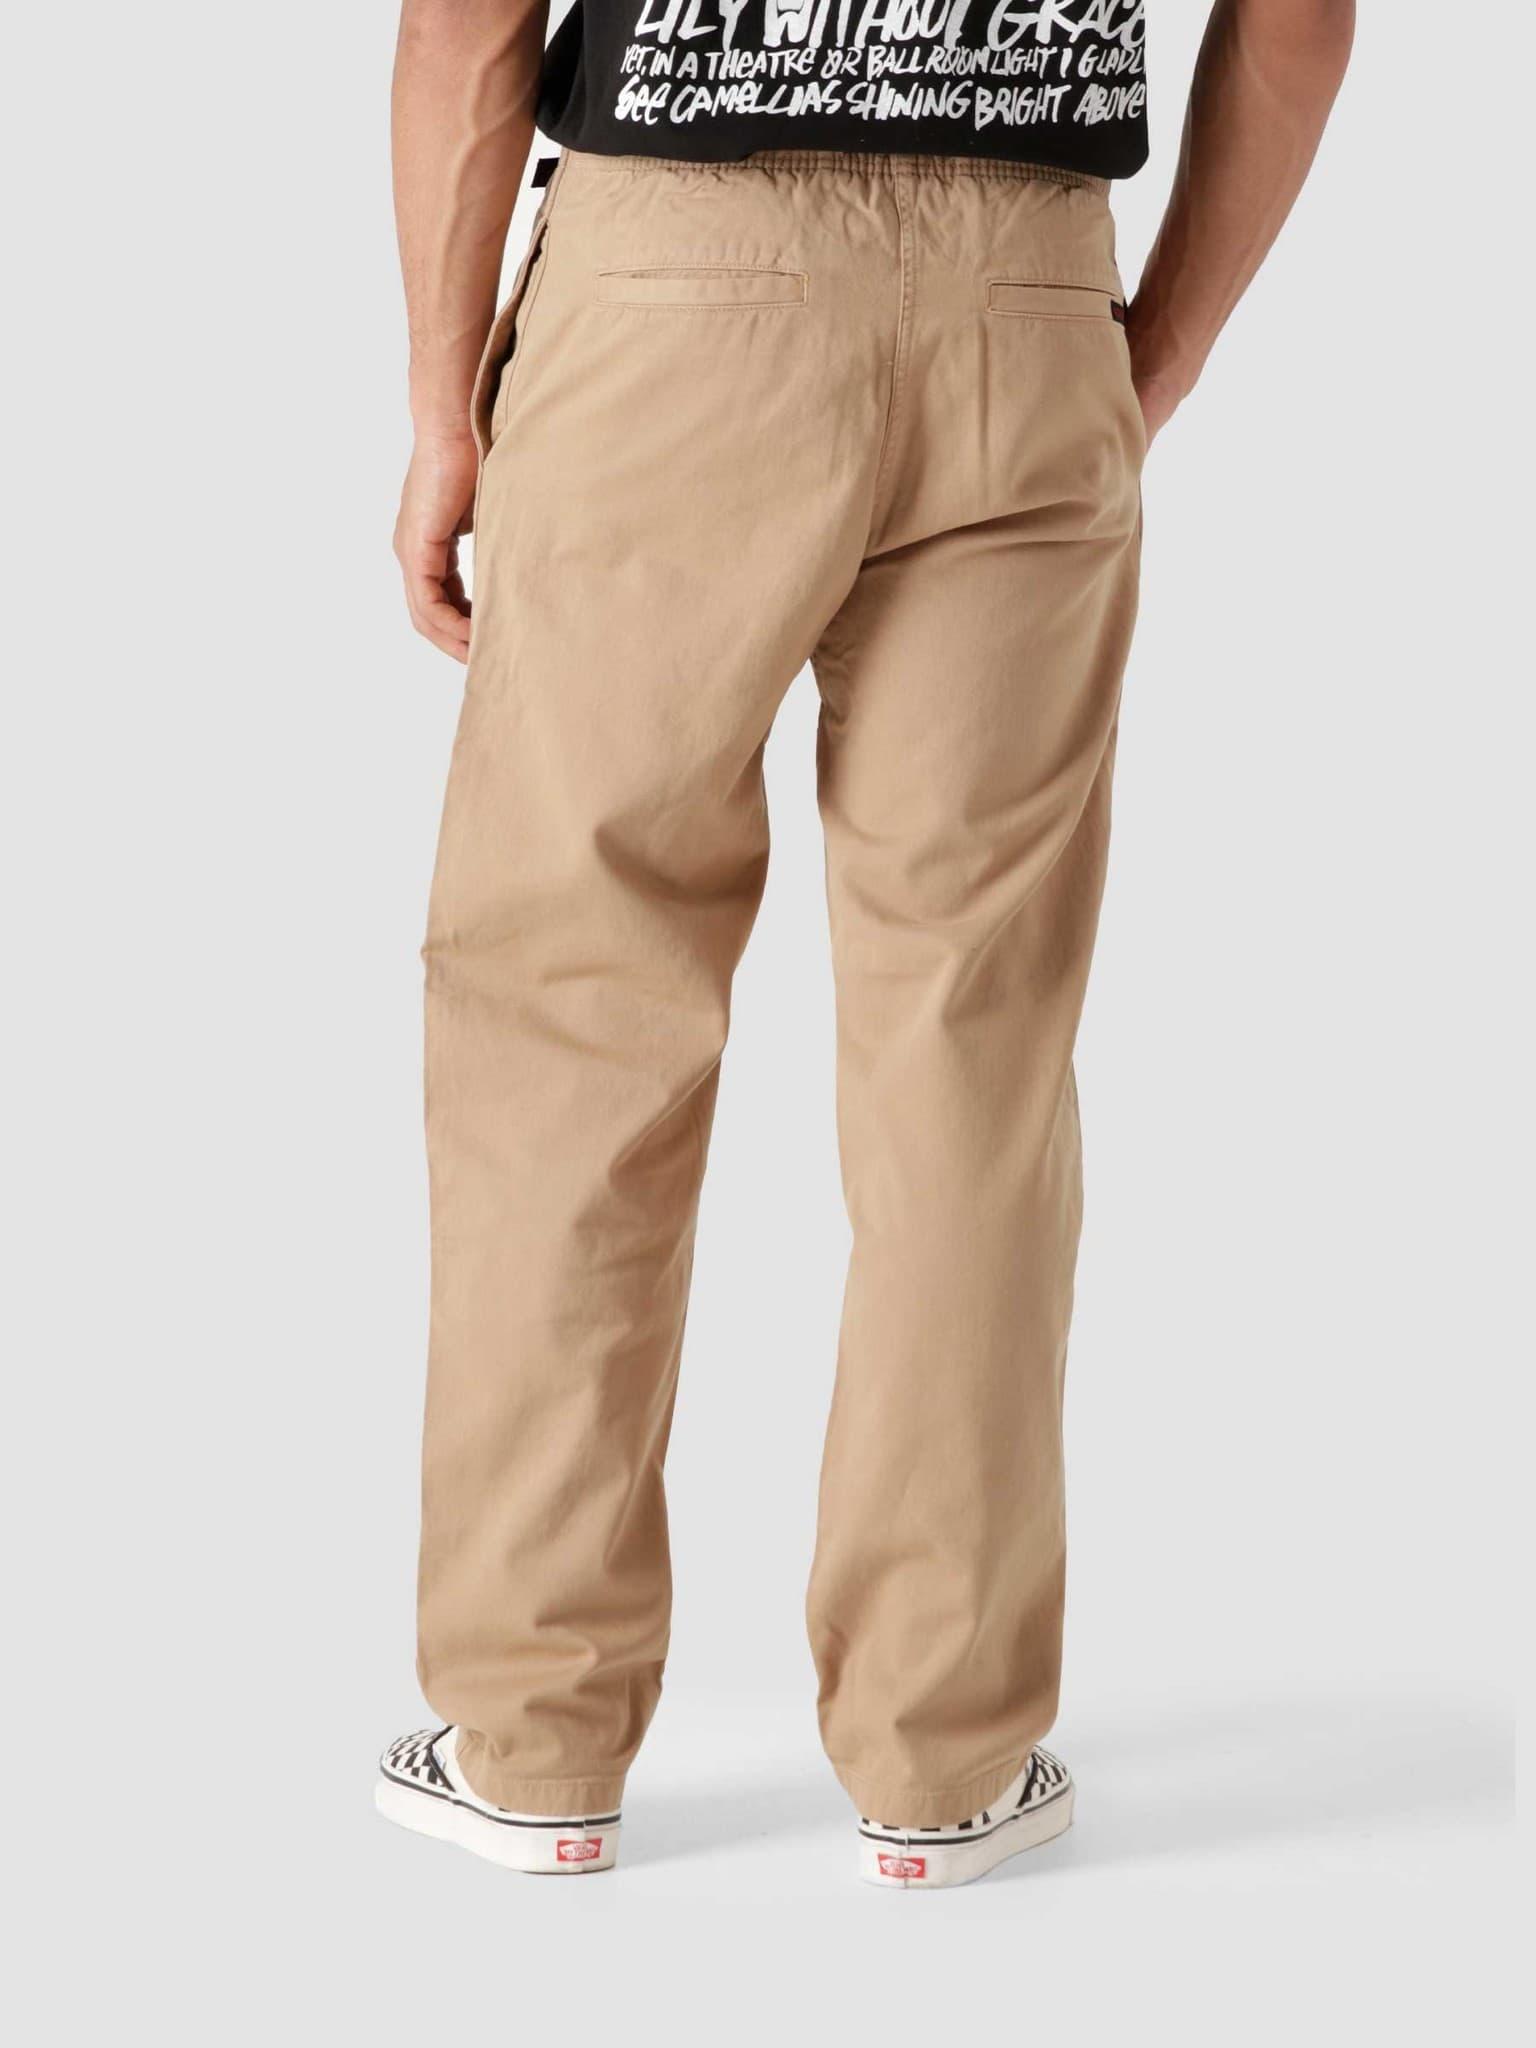 Pants Chino 8657-56J